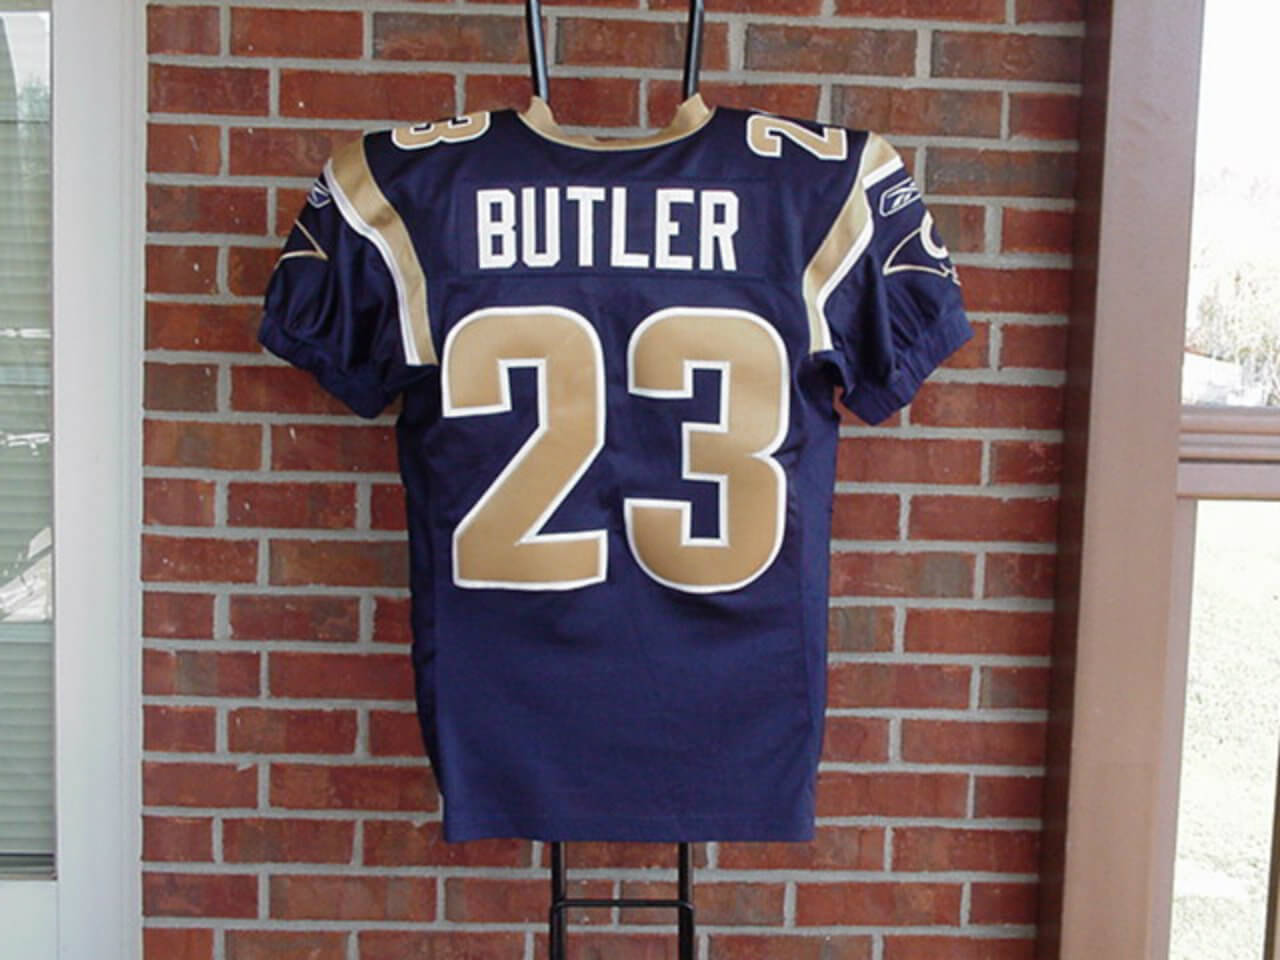 2004 St Louis Rams - Jerametrius Butler Game-Worn Uniform Incl. Jersey, Helmet & Cleats (Wetrak)